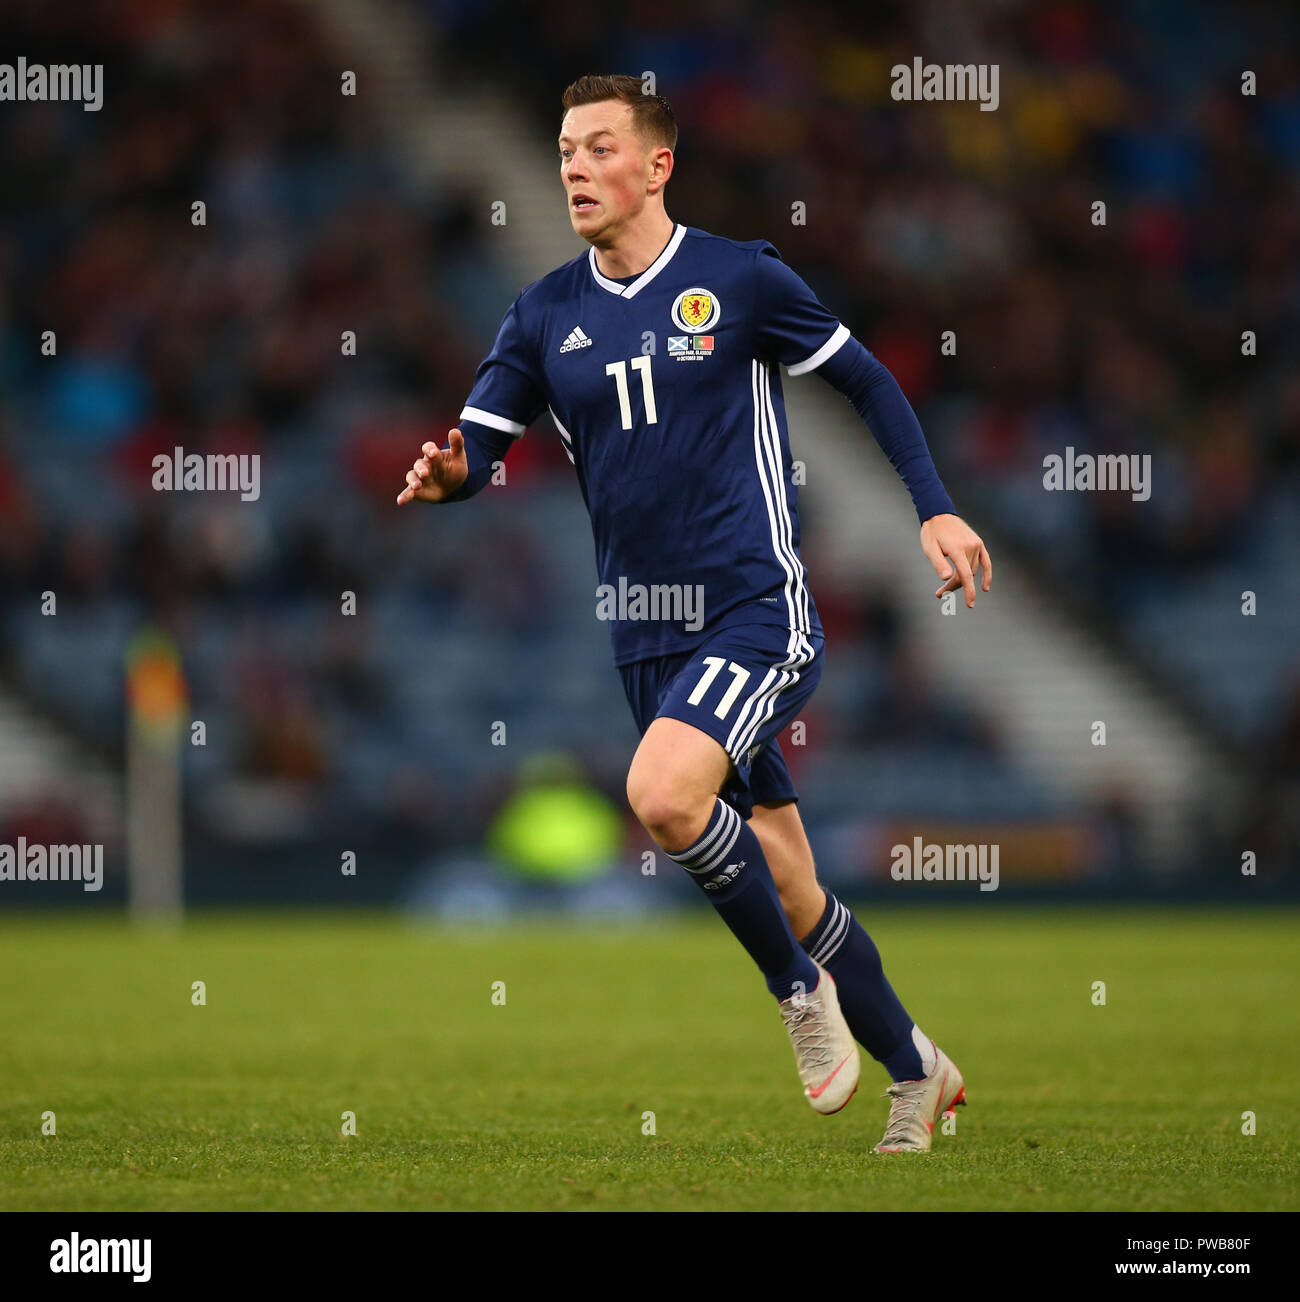 Hampden Park, Glasgow, UK. 14th Oct, 2018. International Football Friendly, Scotland versus Portugal; Callum McGregor of Scotland Credit: Action Plus Sports/Alamy Live News - Stock Image